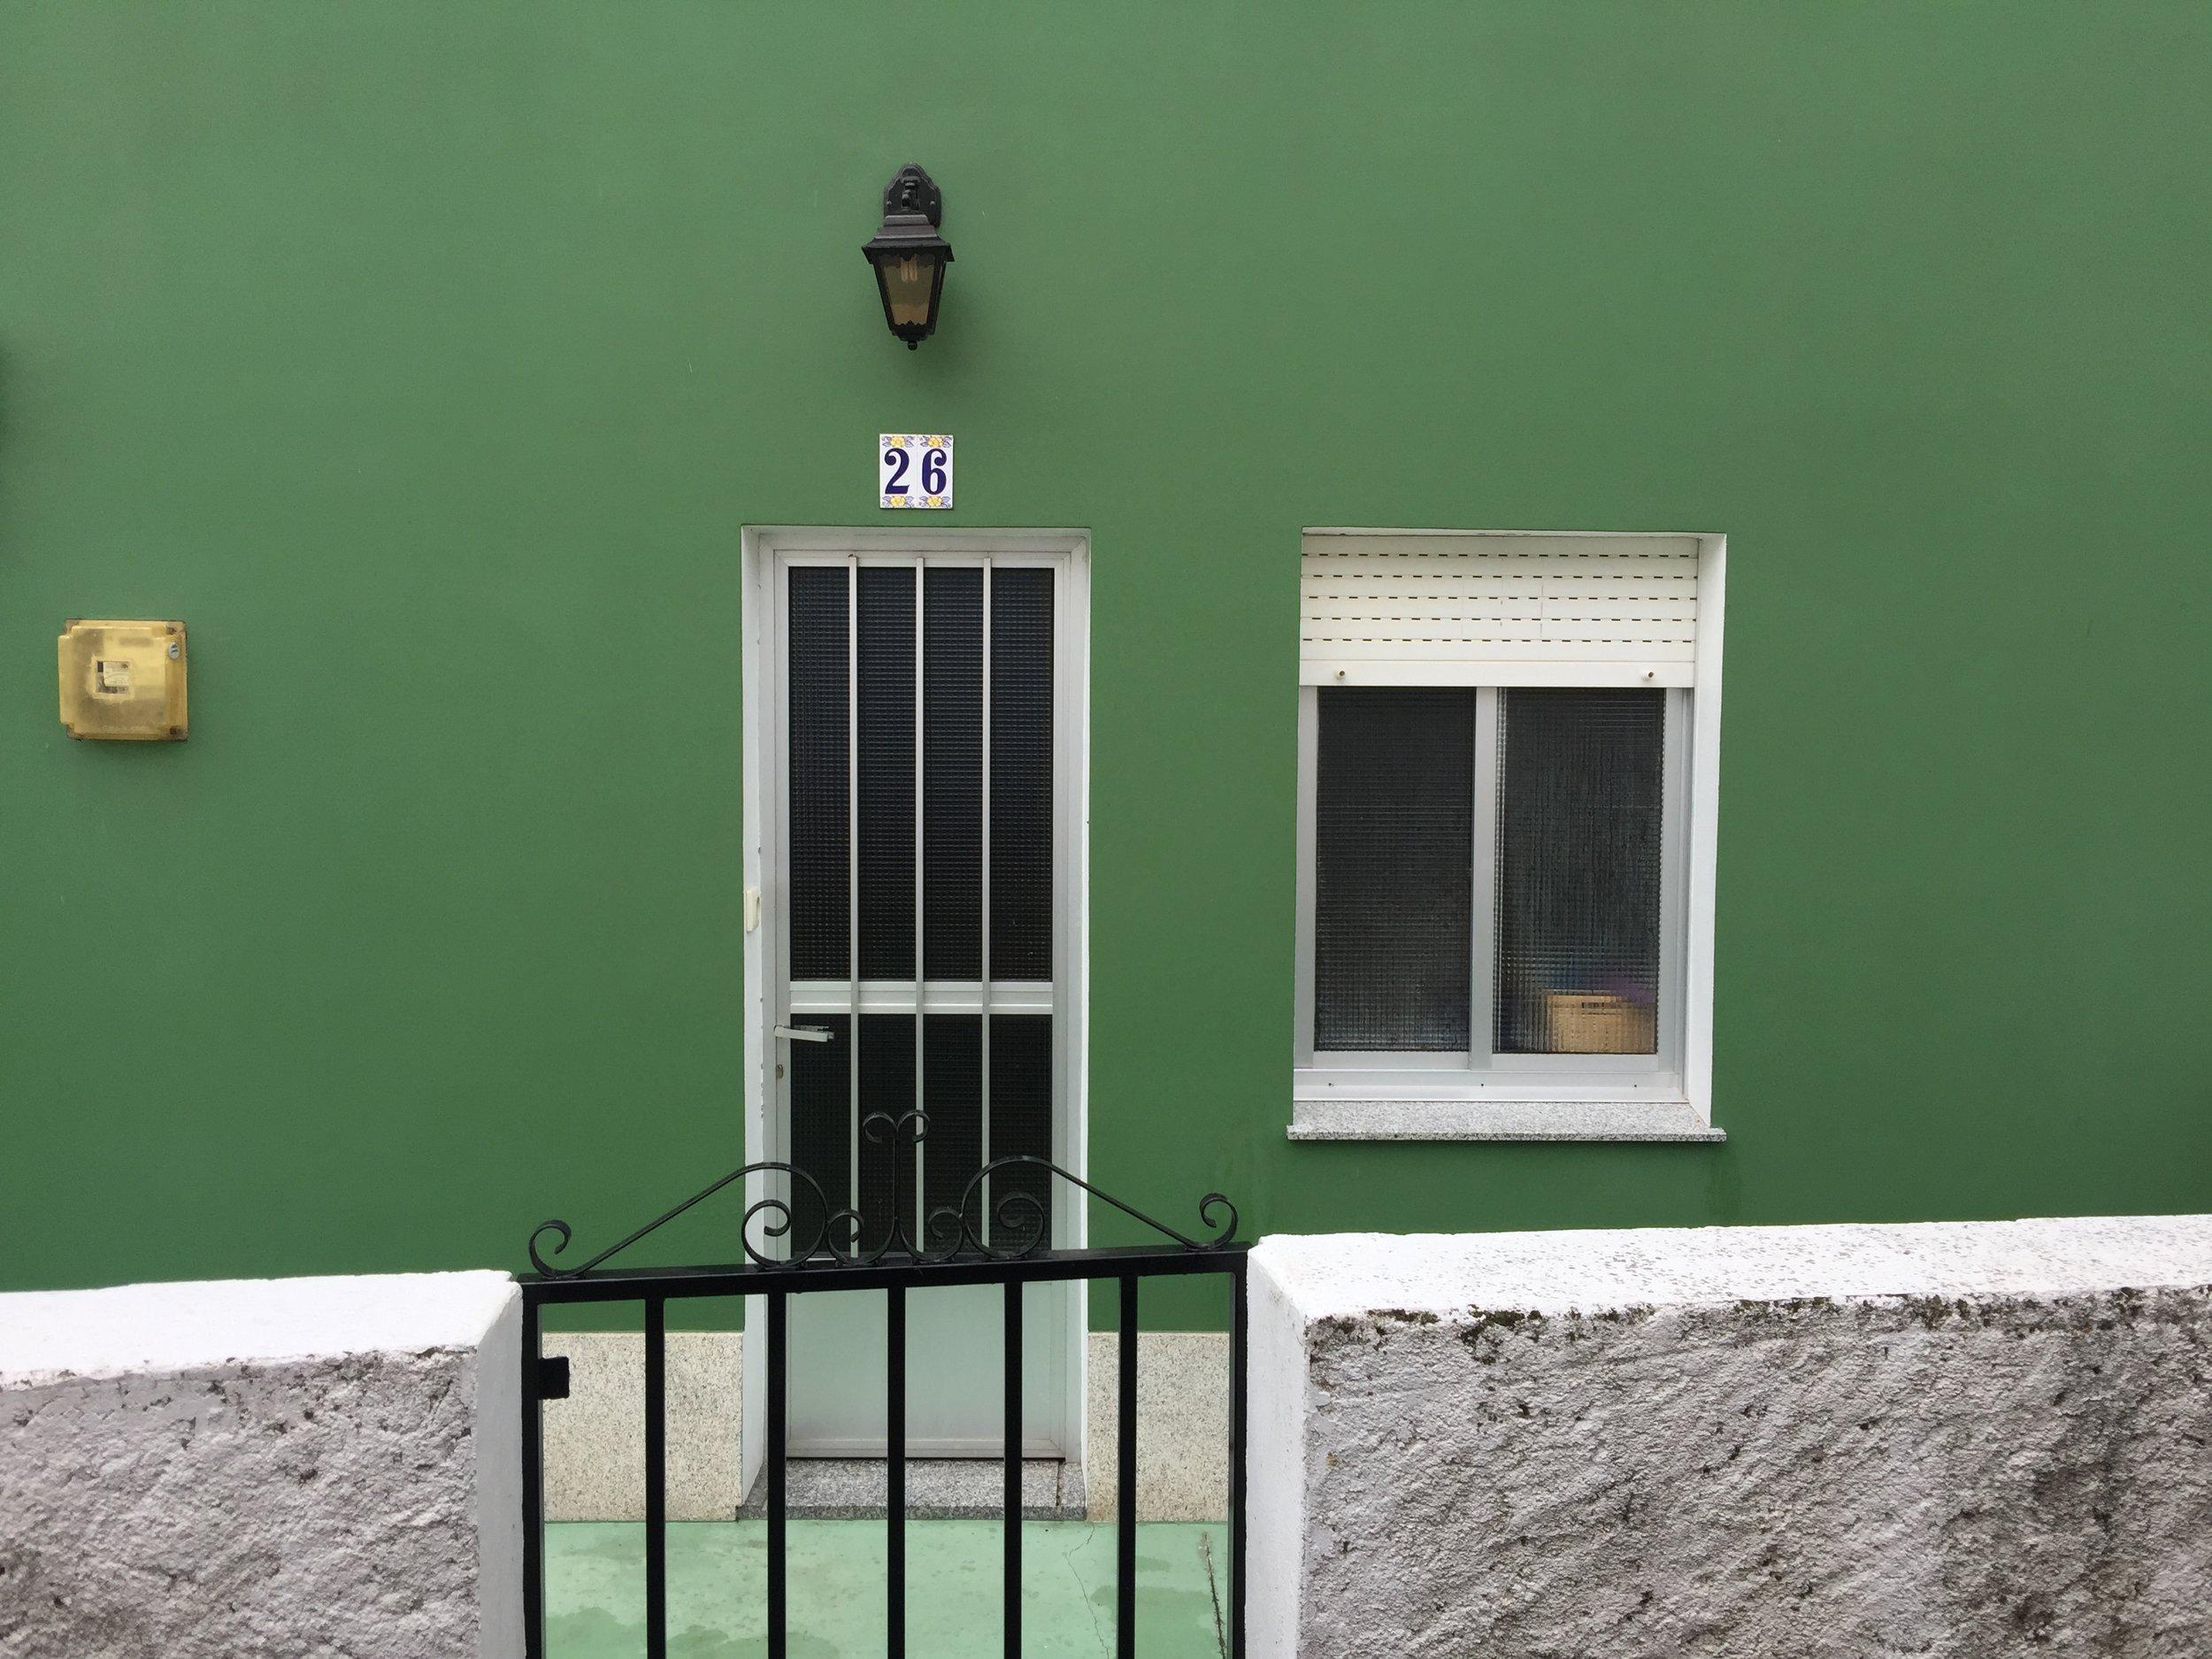 I love the doorways in Spain. Even a bit of 70s aluminium looks good here.